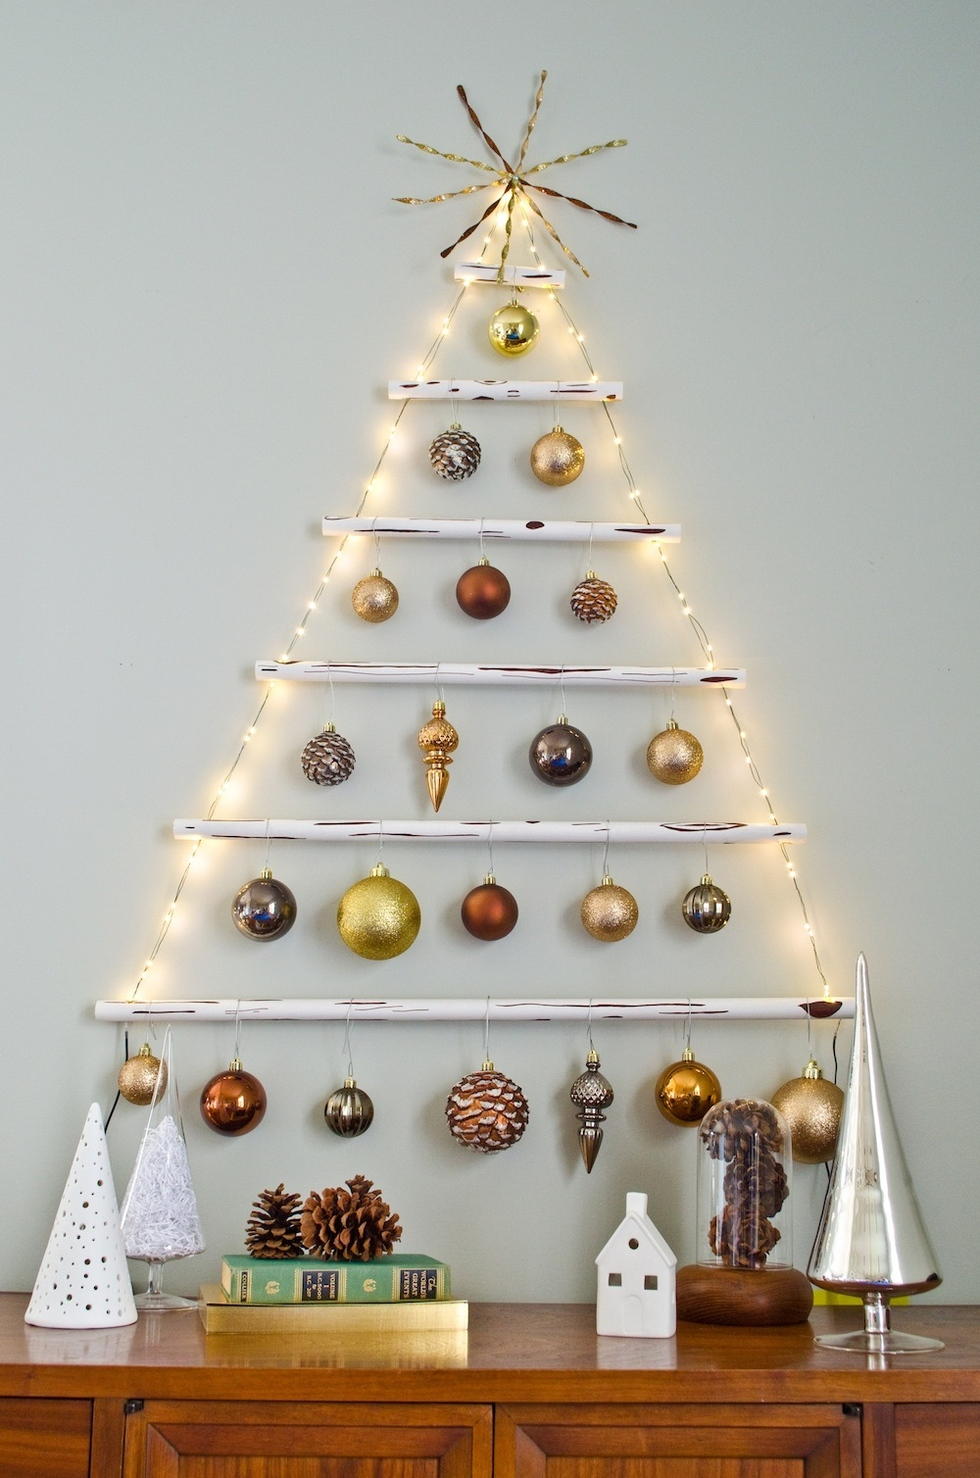 Christmas Tree On Wall With Lights how to make a lighted wall christmas tree | warisan lighting